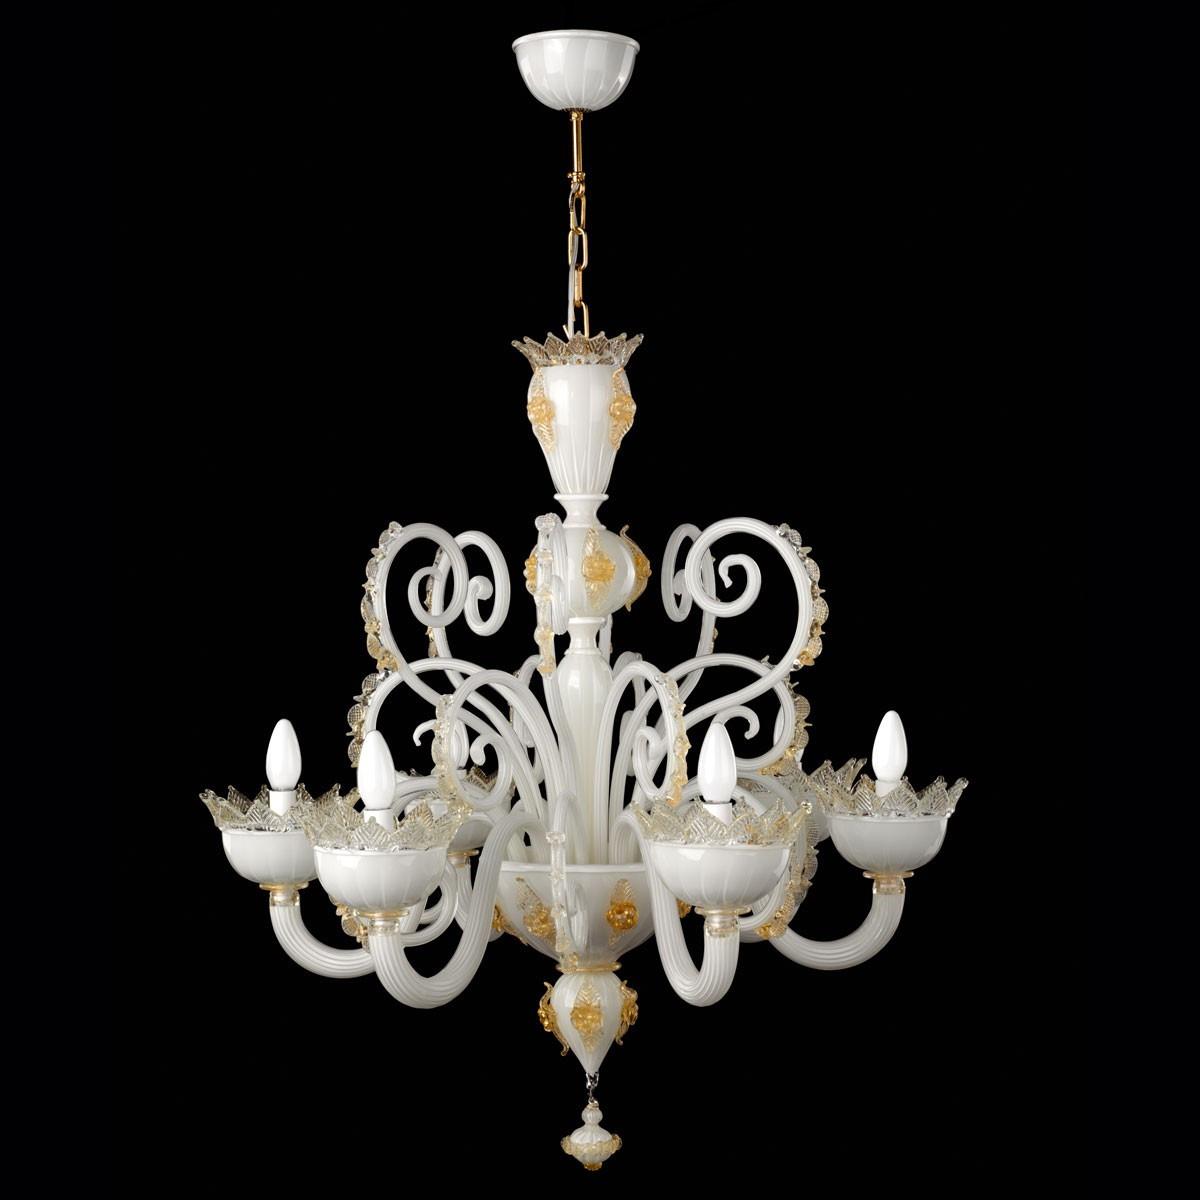 """Contessa"" Murano glass chandelier - 6 lights"